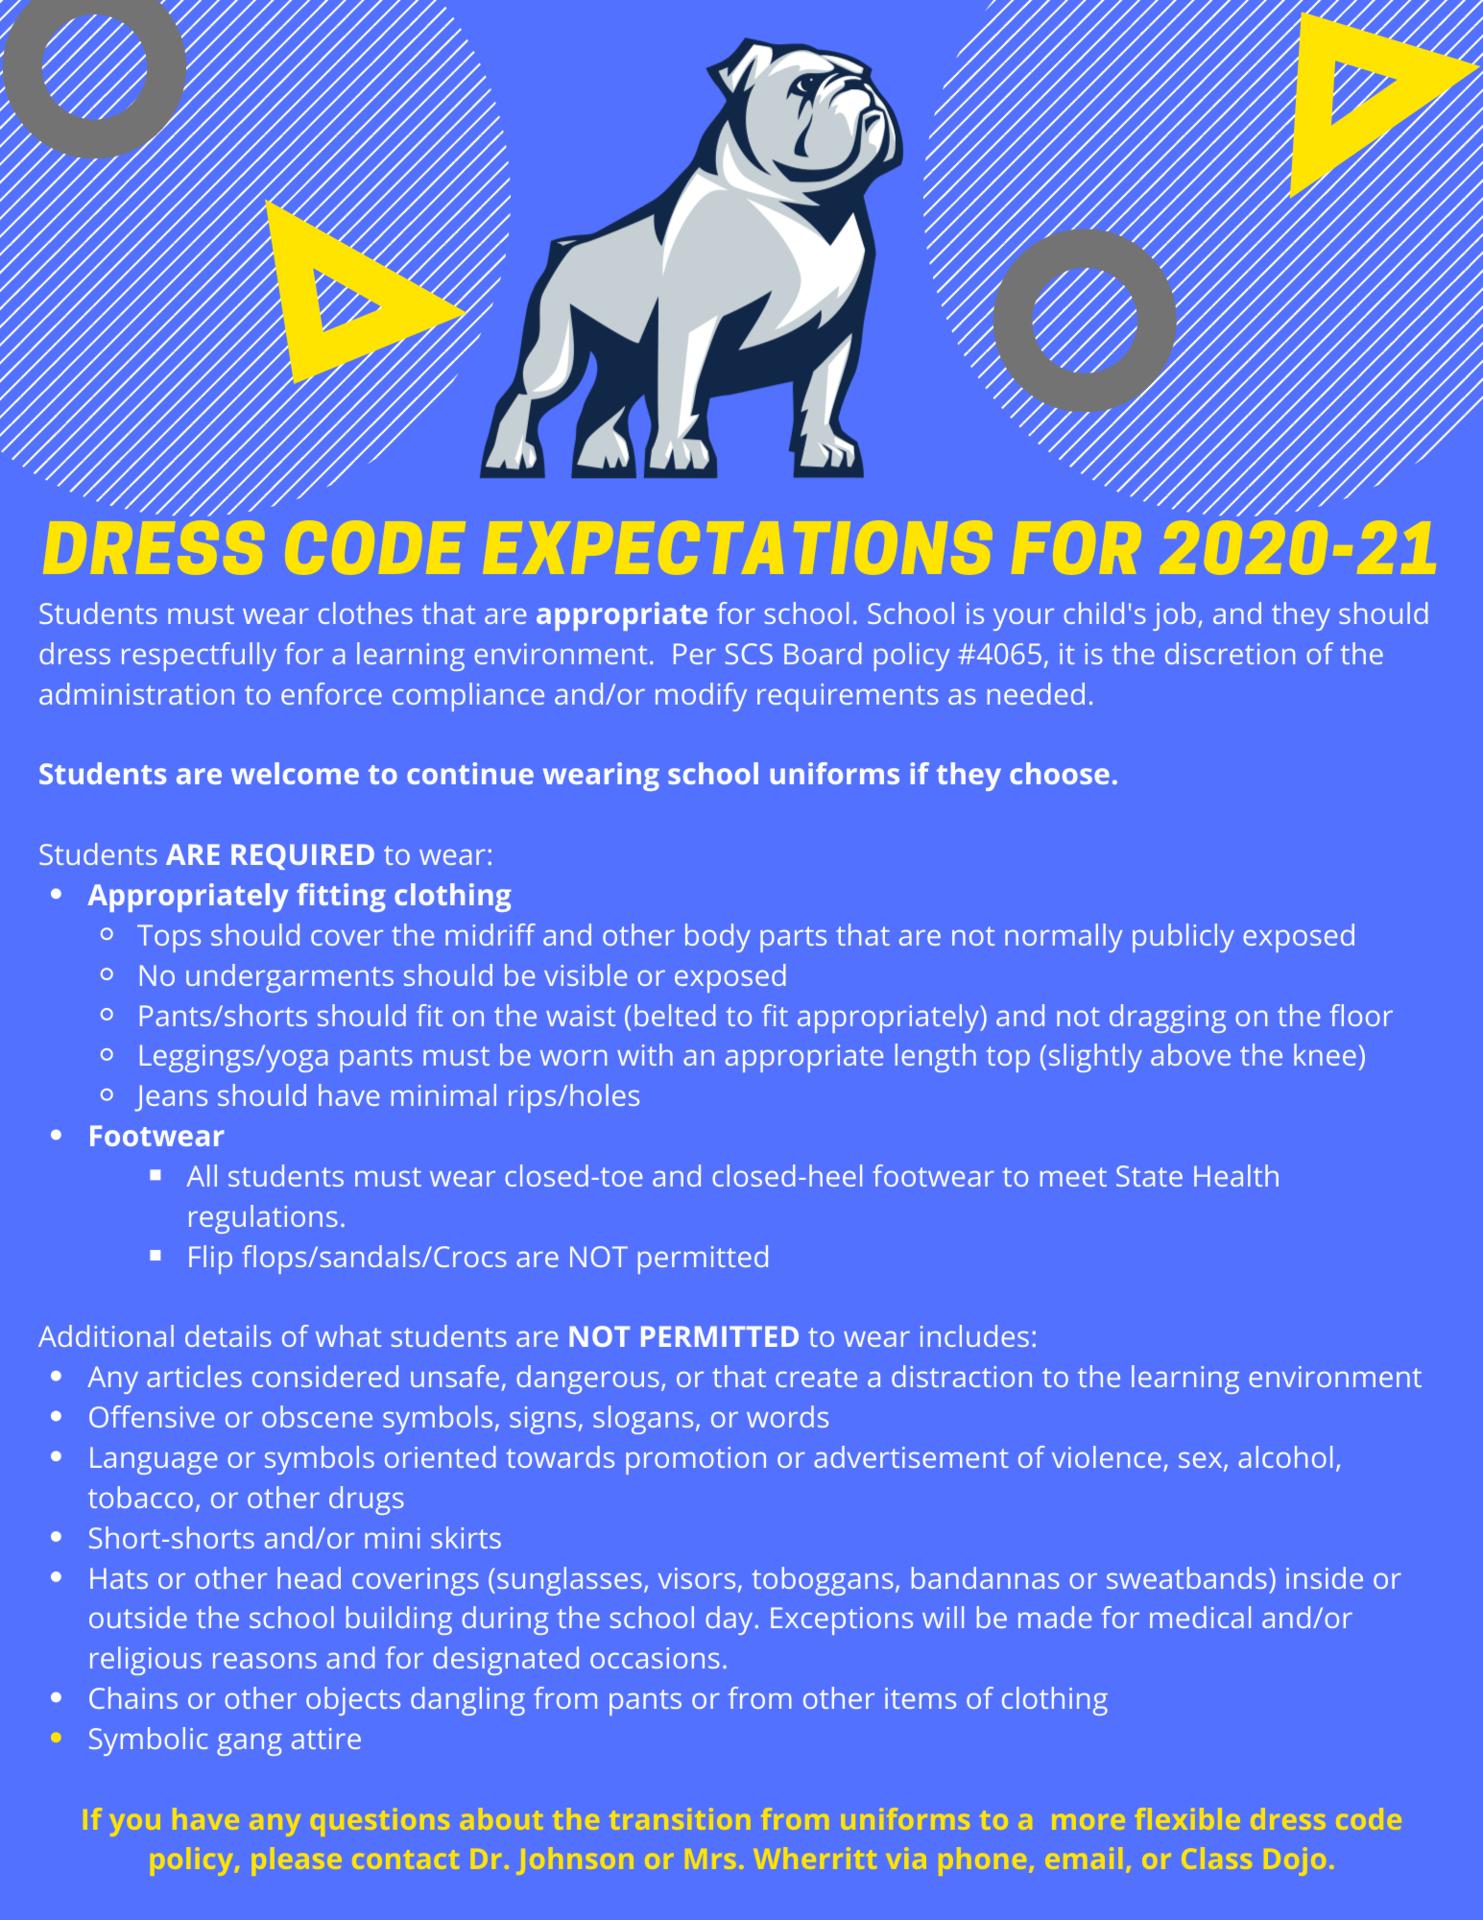 Dress Code pg. 2